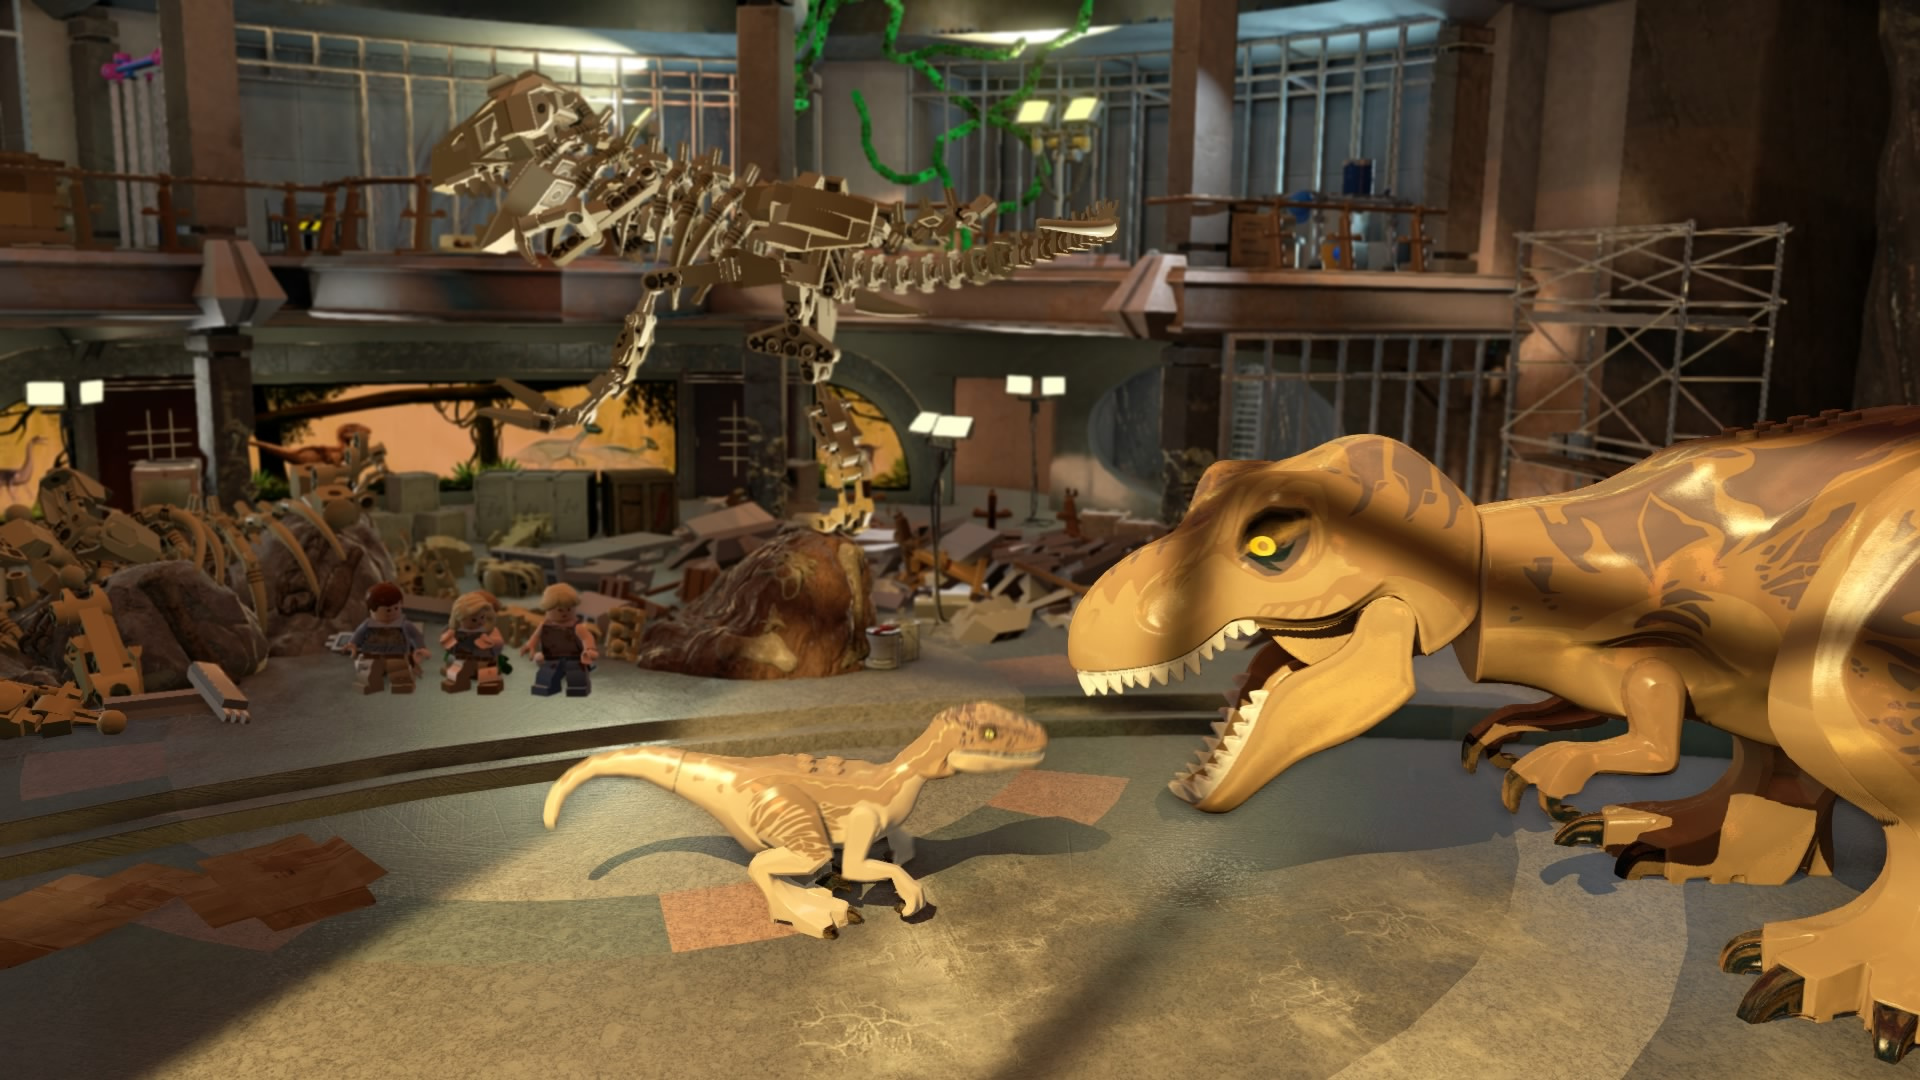 LEGO Jurassic Park (2015) - Xbox 360 - YouTube